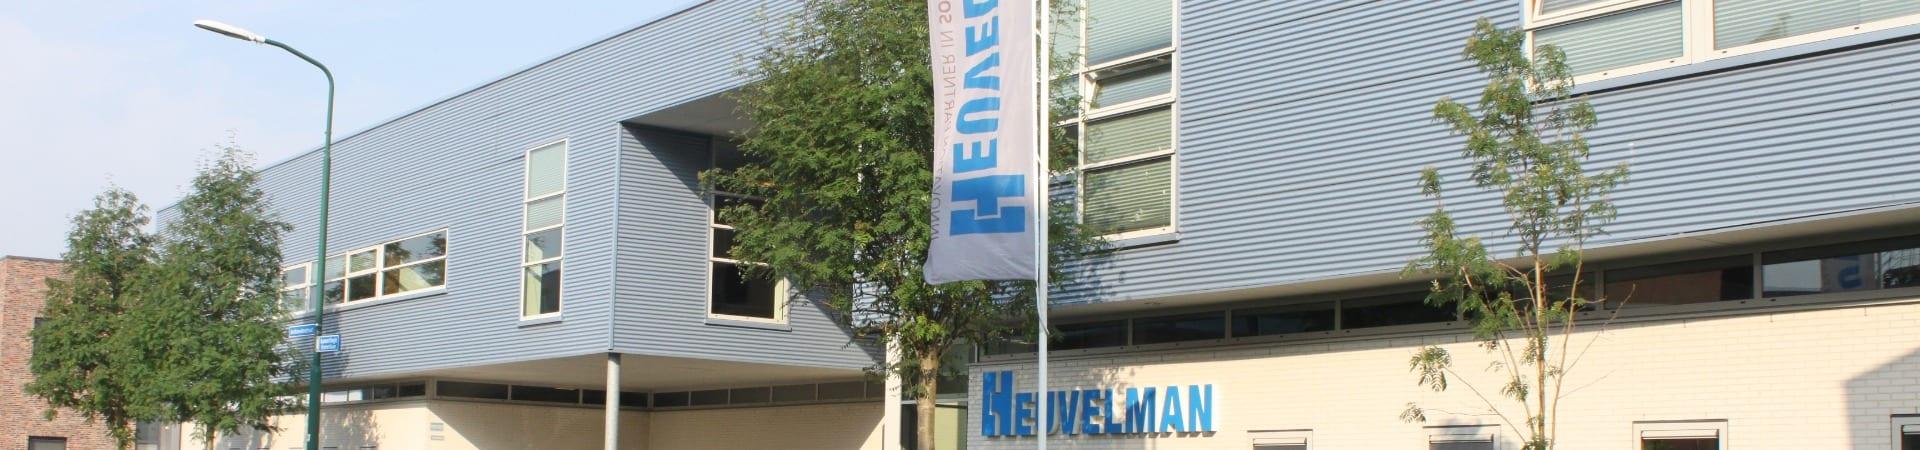 Heuvelman - Functioneel Systeembeheerder